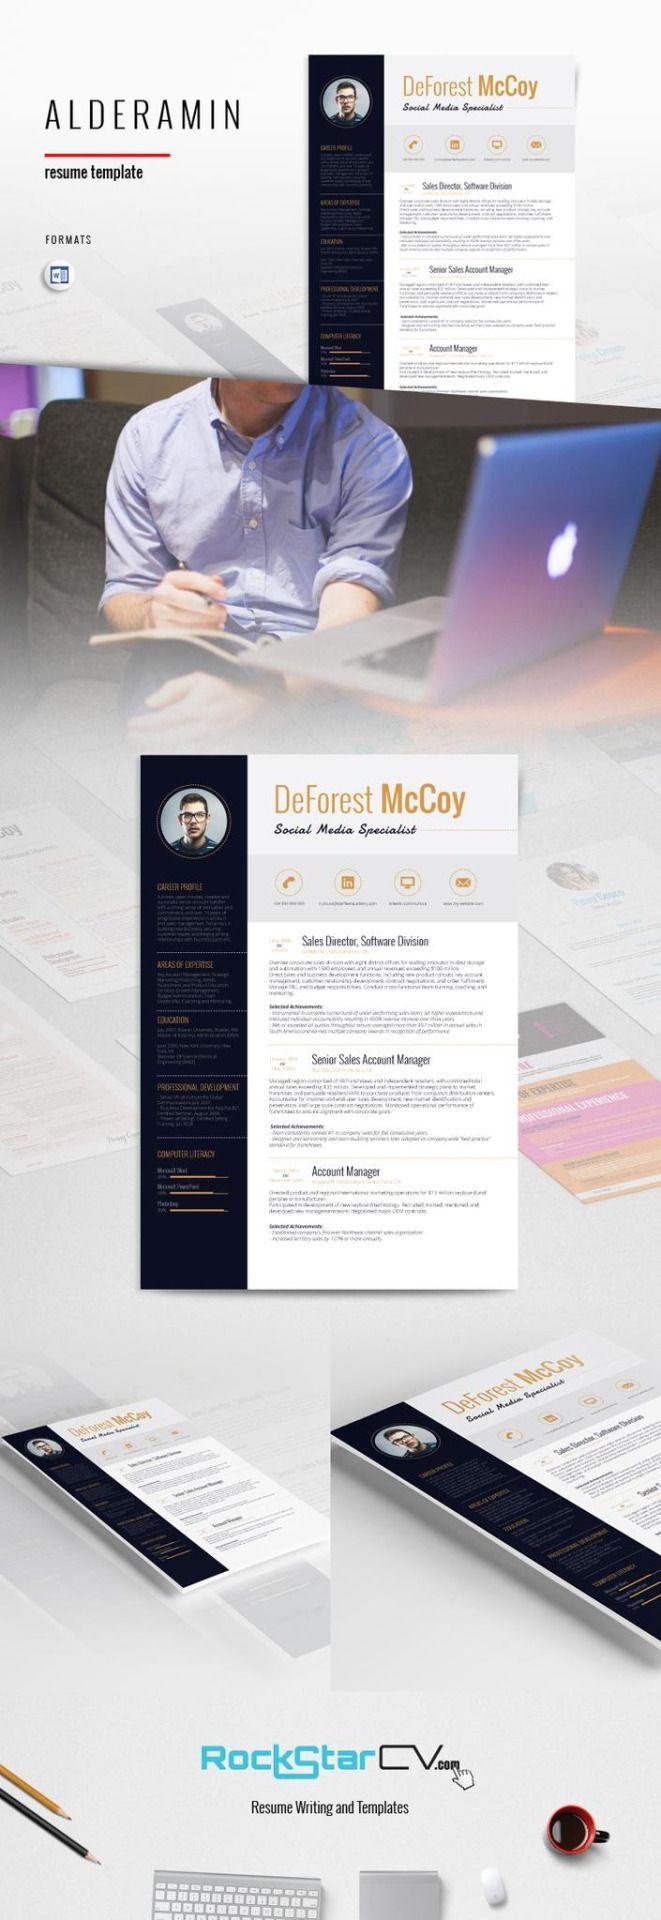 Resume Formatting Cawley Career Education Center Alderamin Resume Template Httptco71km9mdwpc Httpt